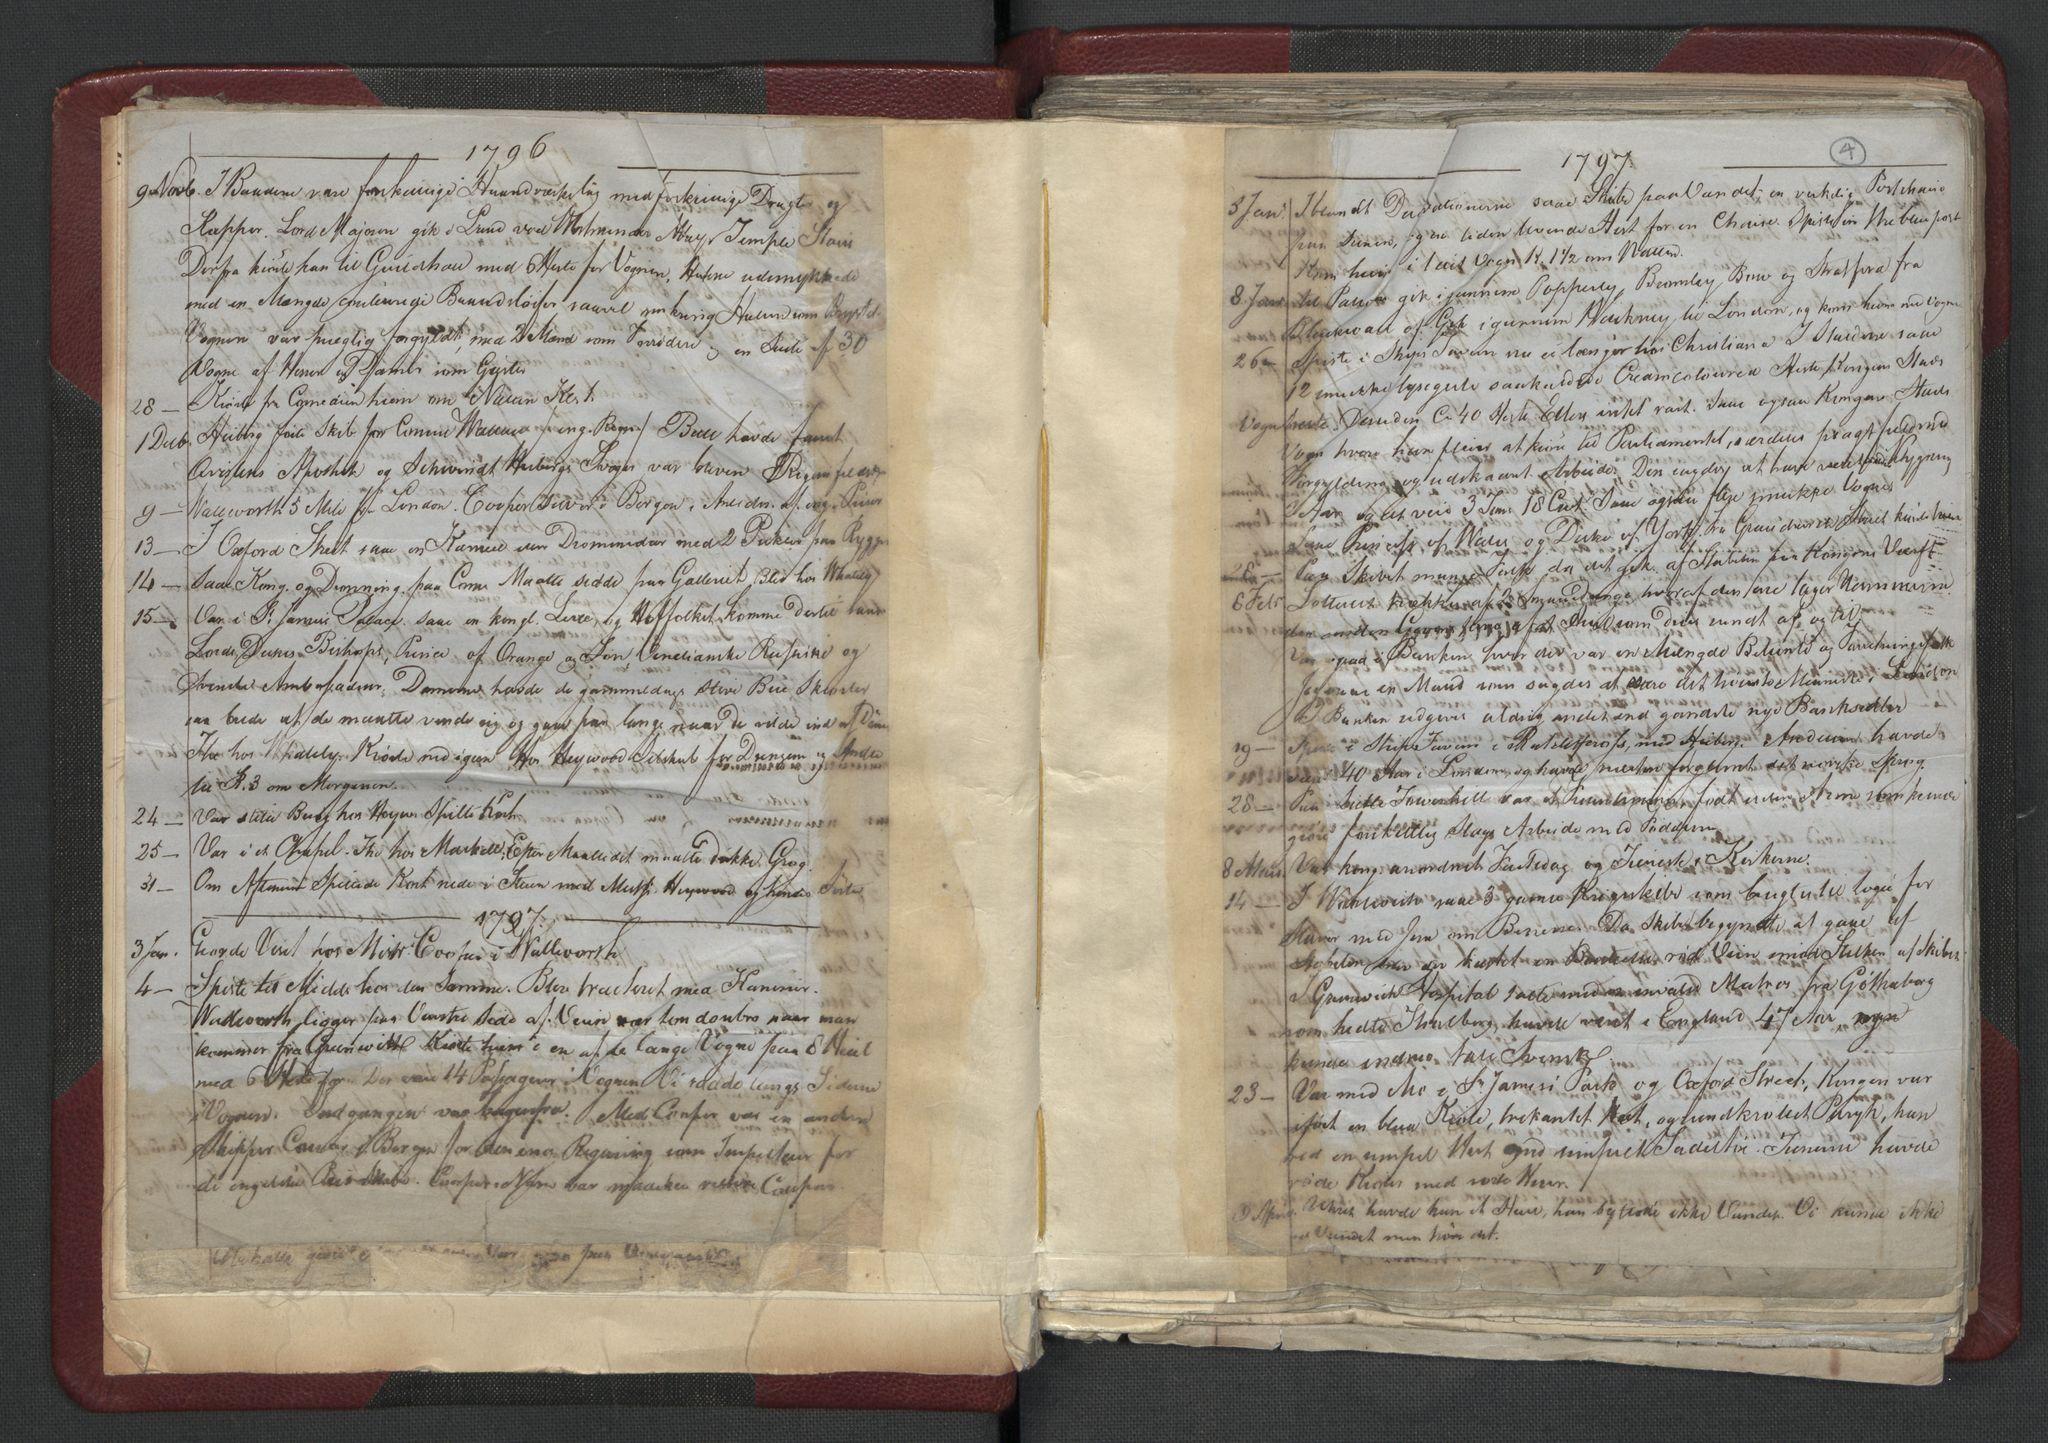 RA, Meltzer, Fredrik, F/L0001: Dagbok for årene 1796-1808, 1811, 1817, 1796-1817, s. 3b-4a